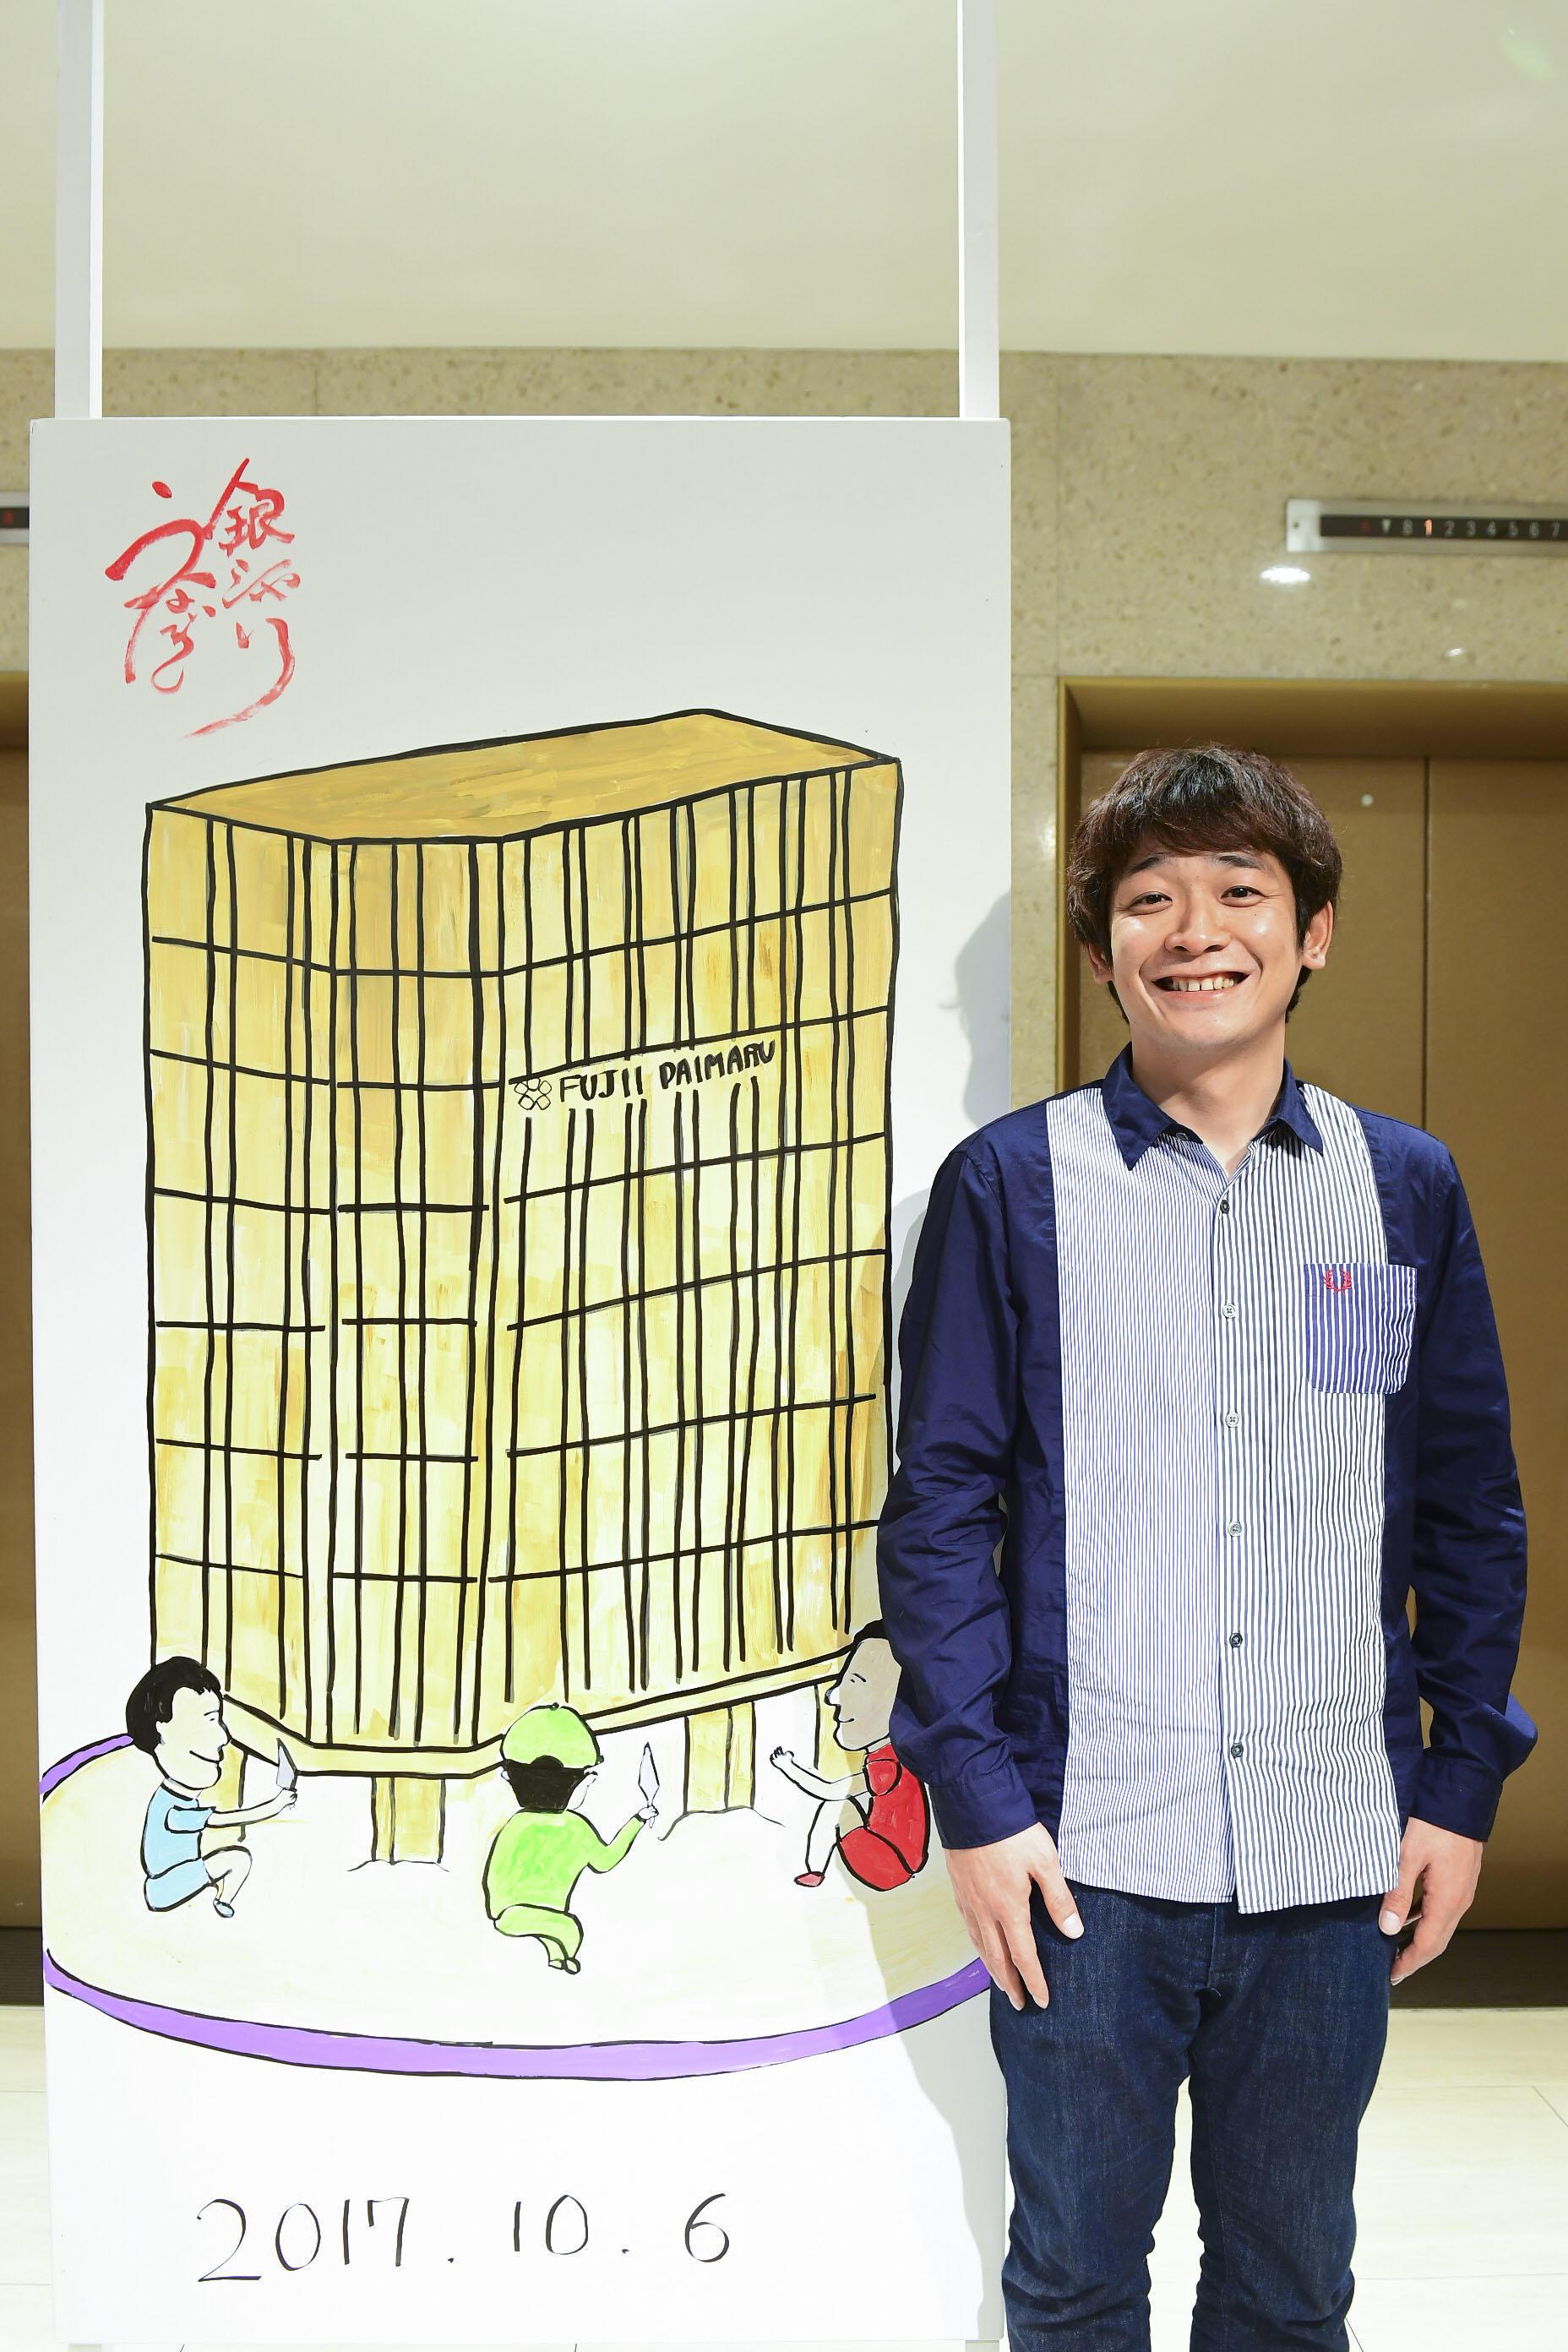 http://news.yoshimoto.co.jp/20171007093118-76308478faefdd893dcfbd224f0ad88af4e79d27.jpg